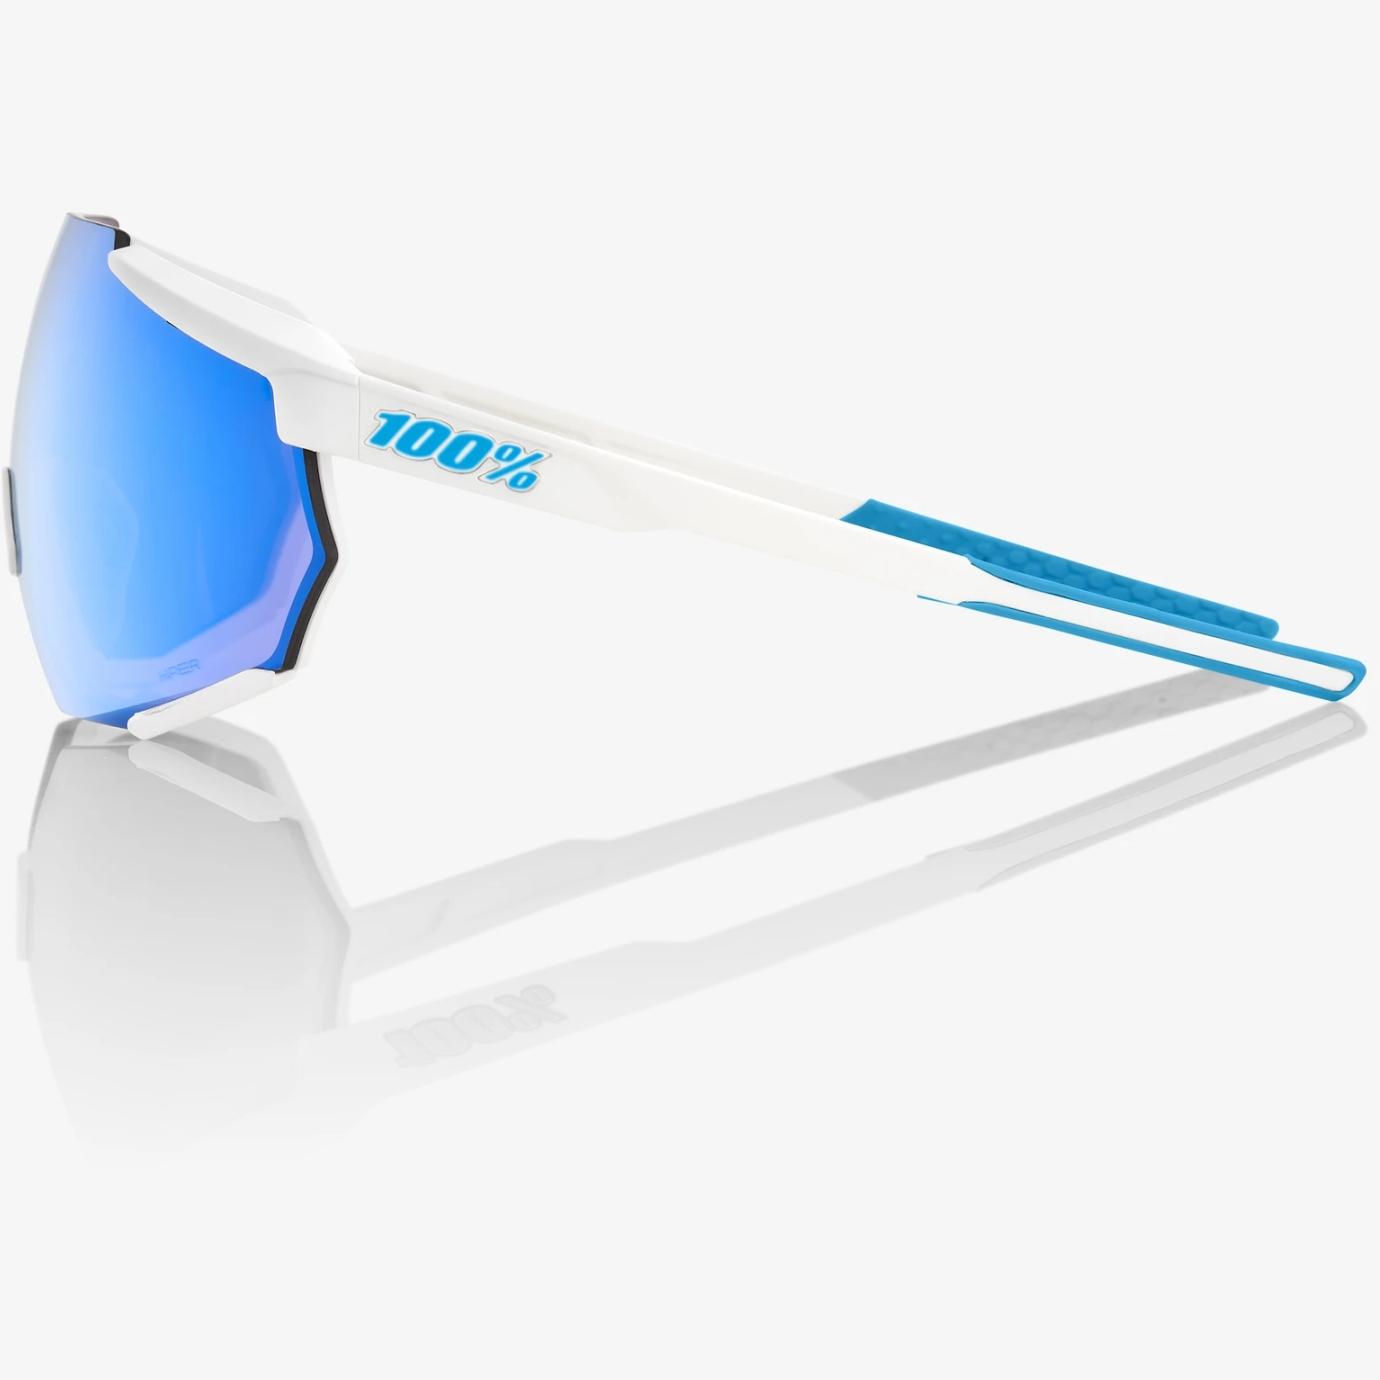 Imagen de 100% Racetrap HiPER Mirror Gafas - Movistar Team White/Blue Multilayer + Clear